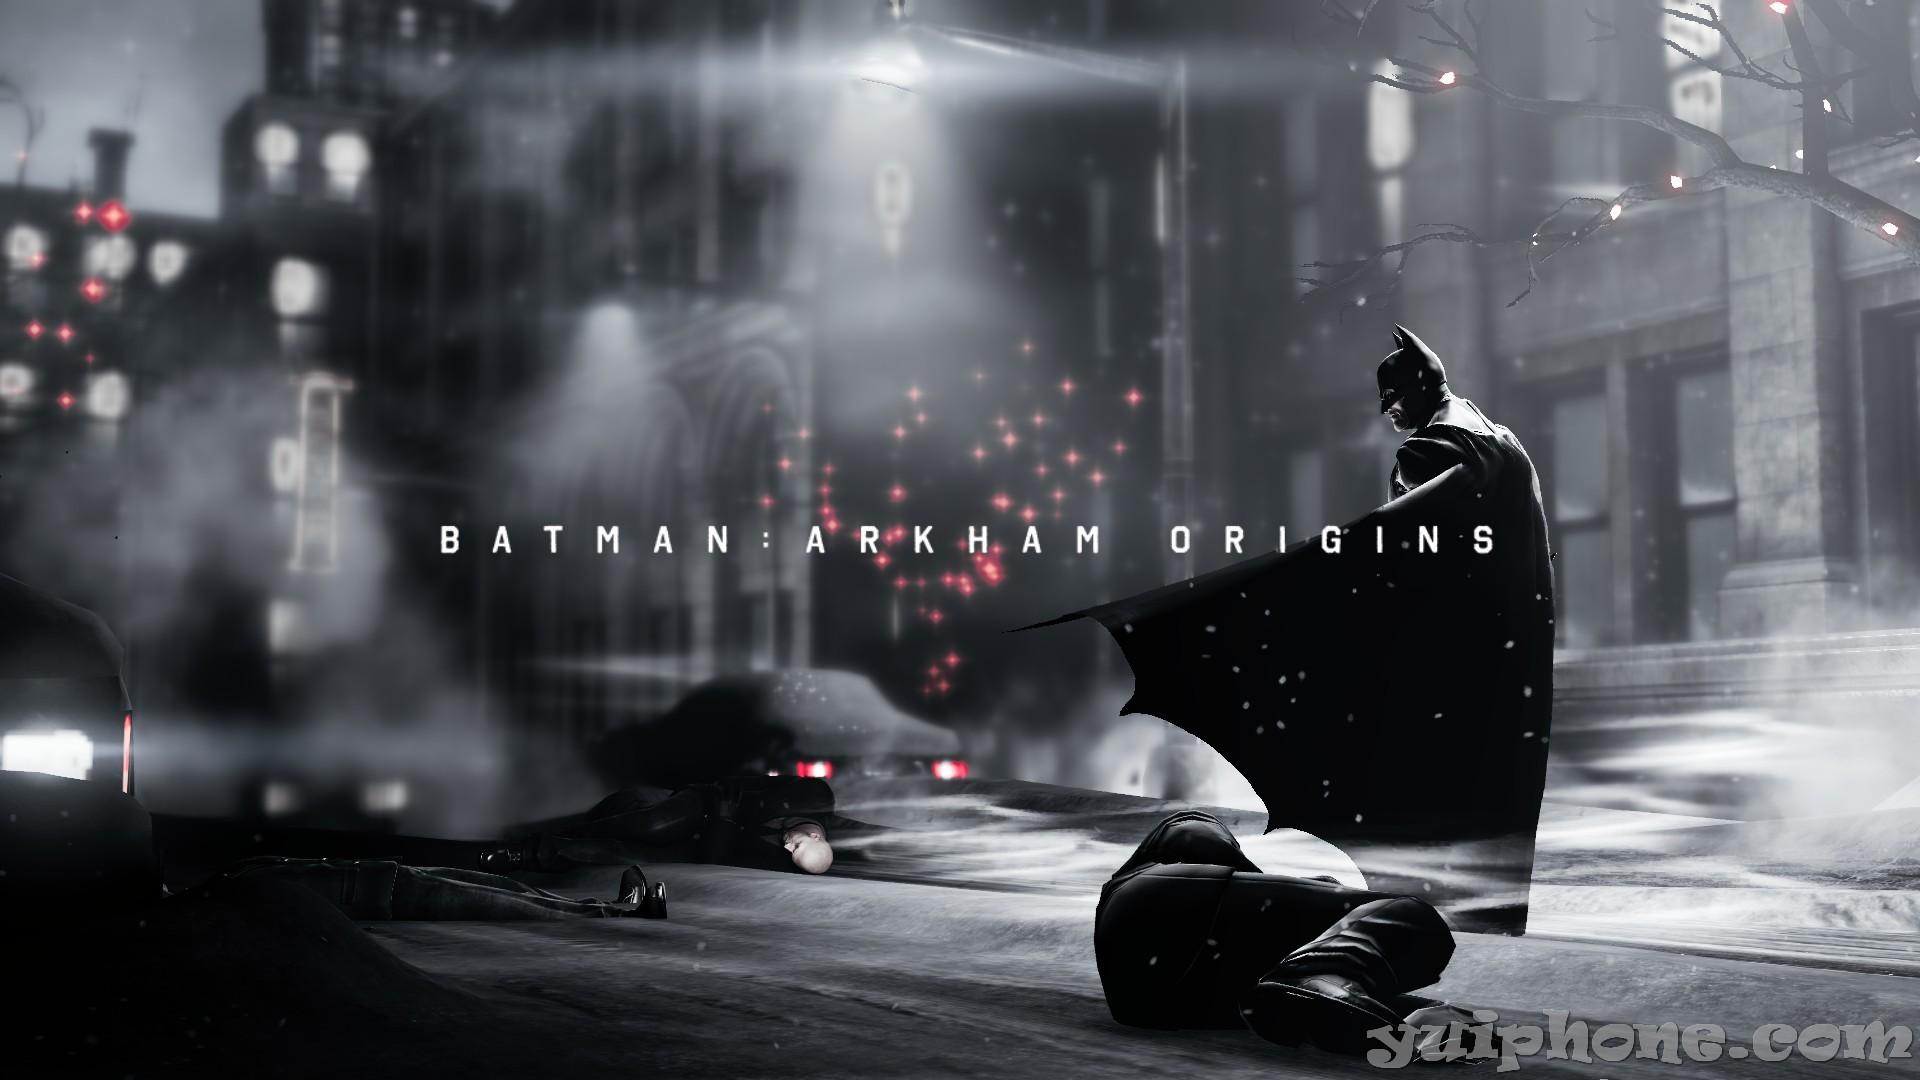 Batman Dark City Streets Arkham Origins Wallpaper Yuiphone 1920x1080